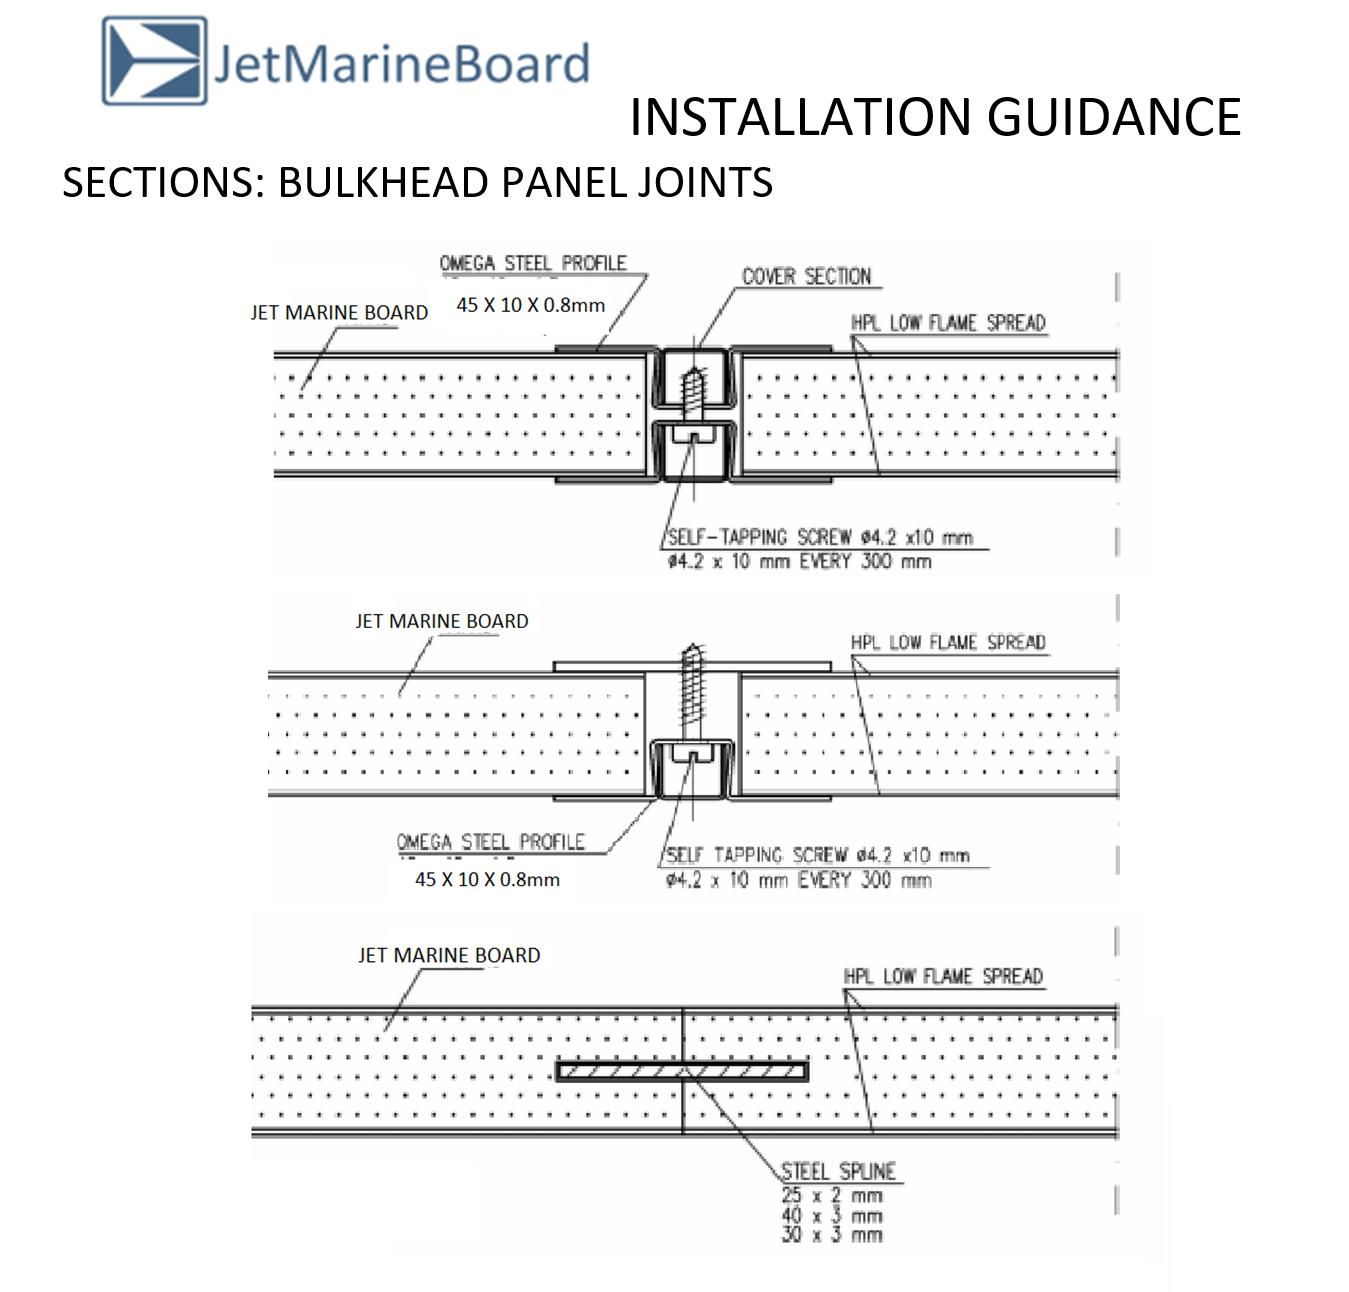 JetMarine Board Configuration